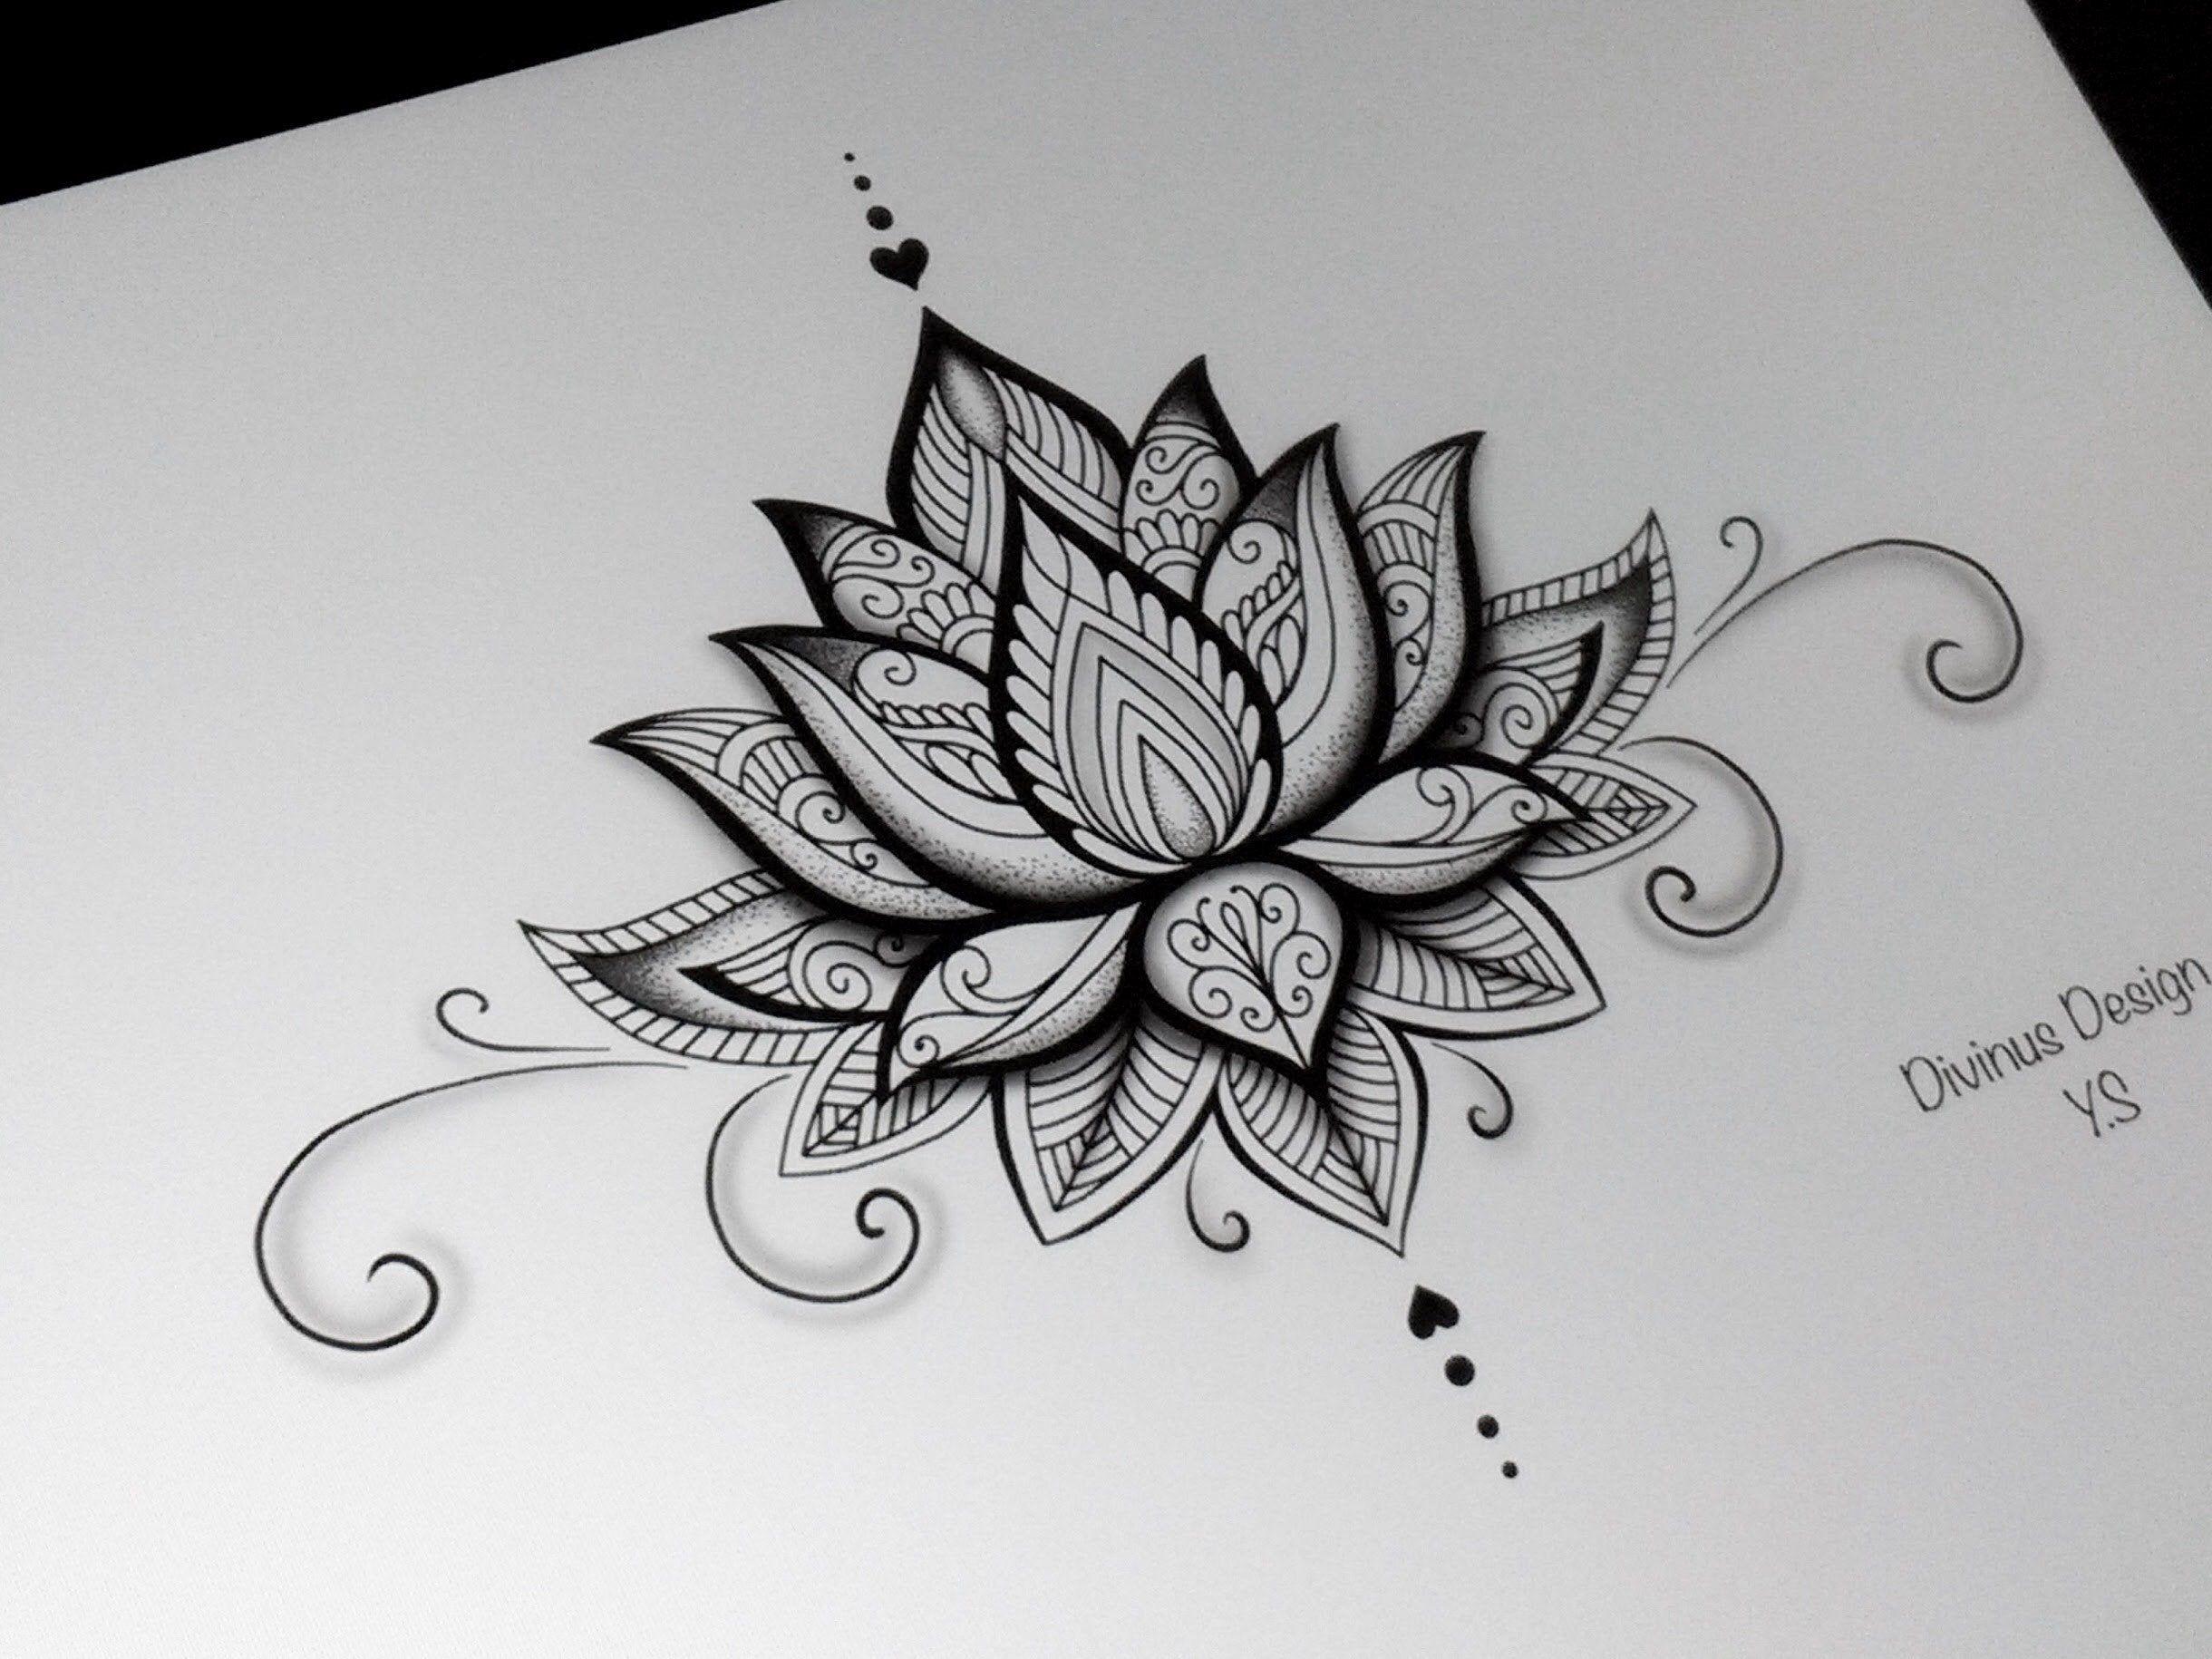 Lotus Mandala Tattoo Design And Stencil Template Instant Digital Download Lotus Mandala Tattoo Mandala Tattoo Design Tattoos